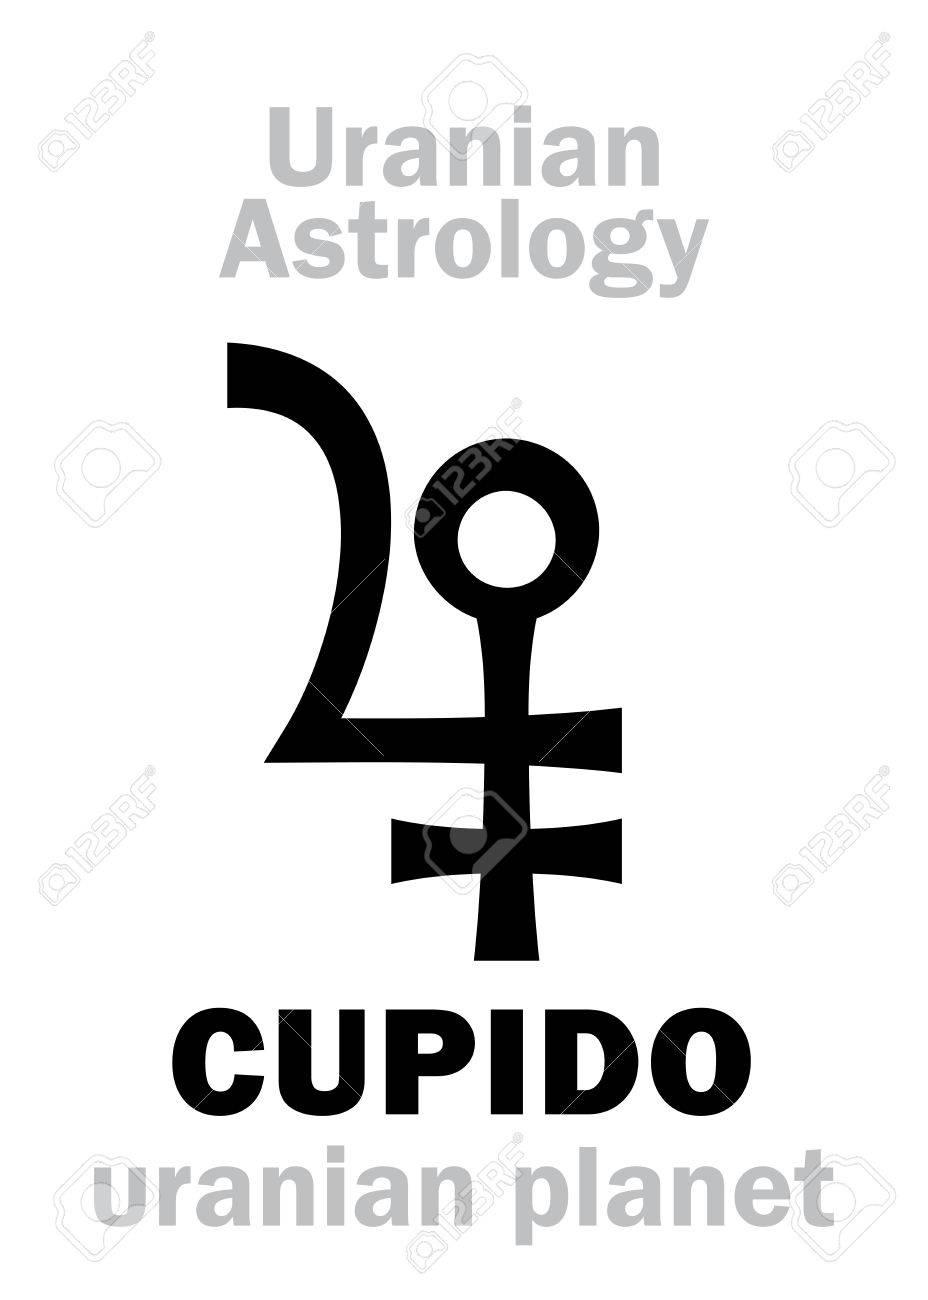 uranian astrology cupido